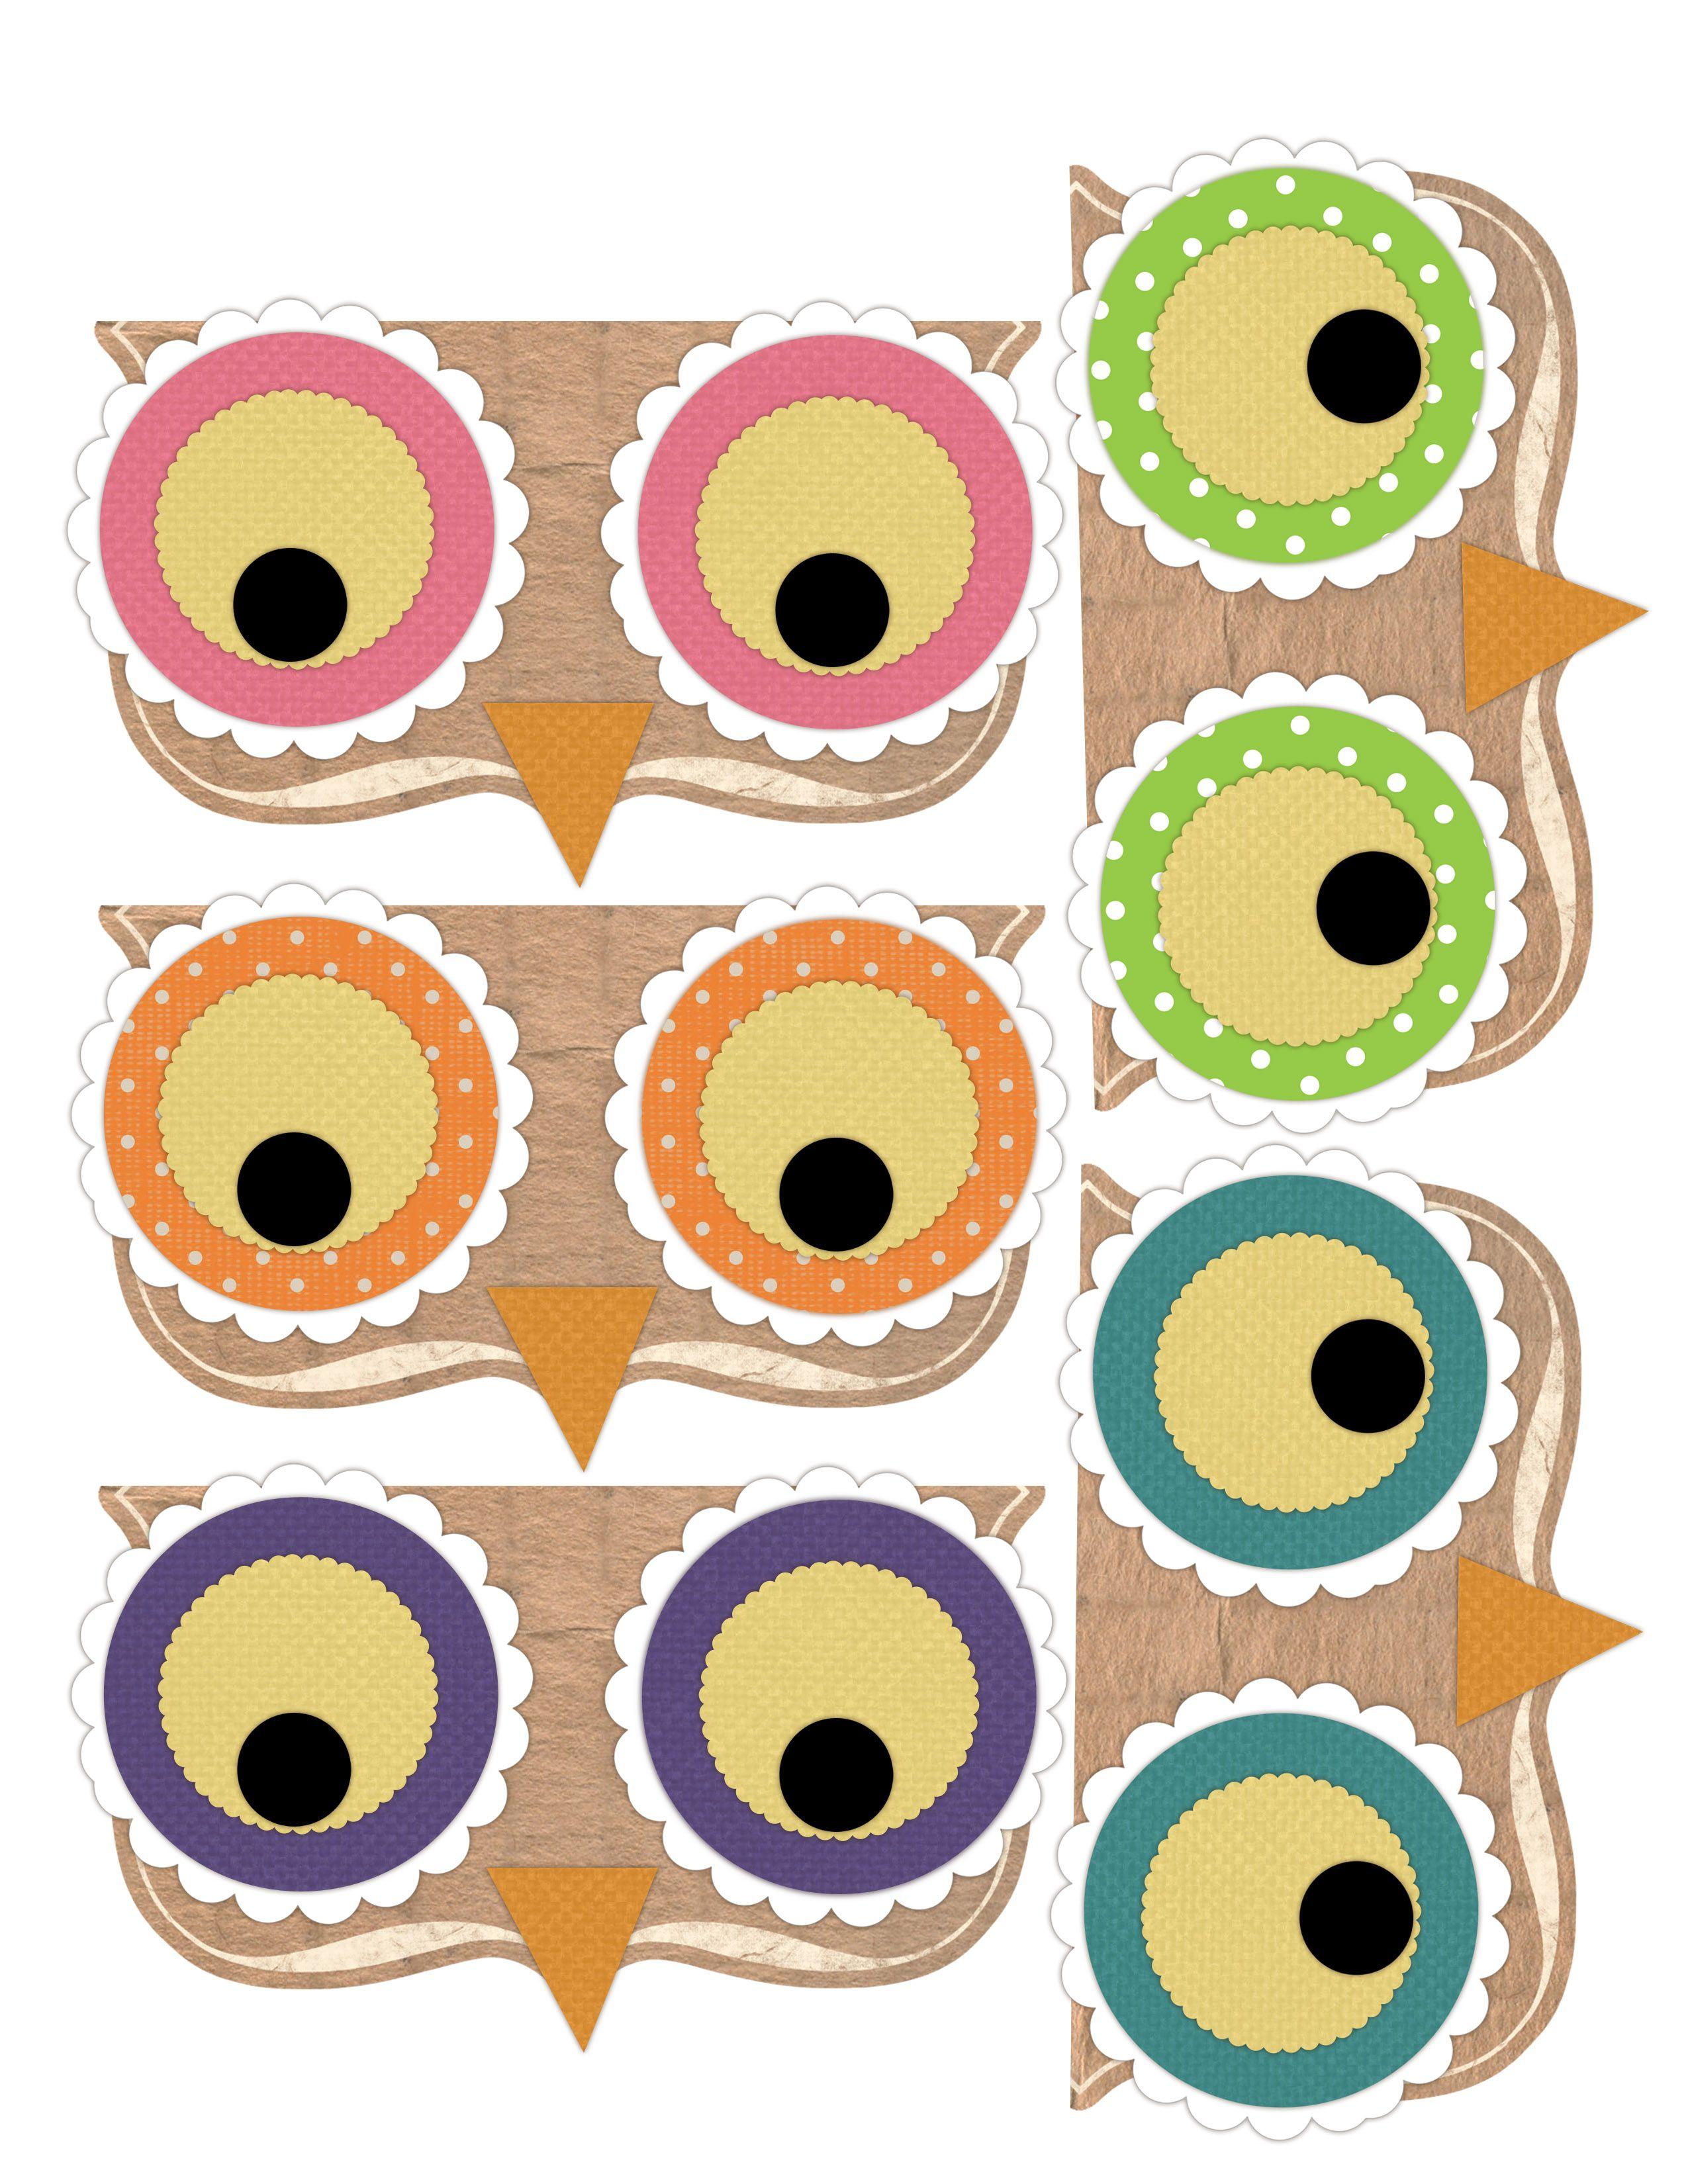 Hybrid Sbooking And More A Fun Treat Idea Owl Bags Treats